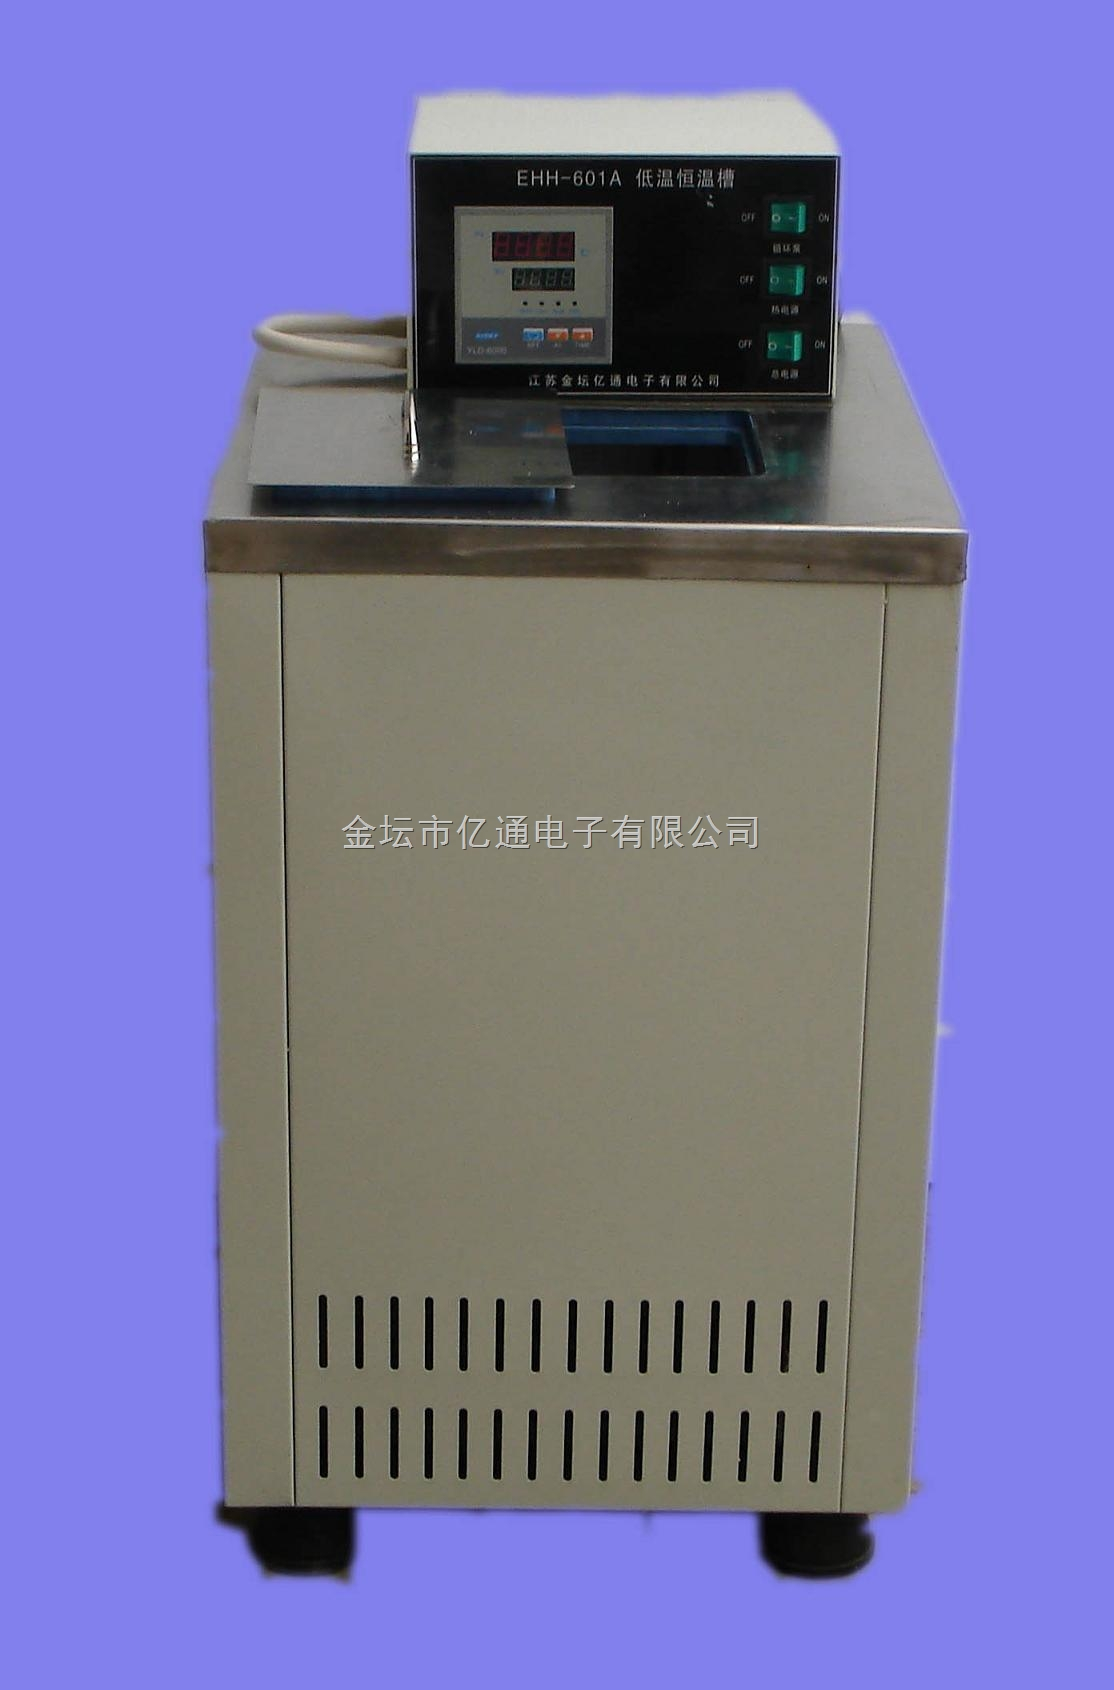 EHH-601A低温恒温槽技术说明